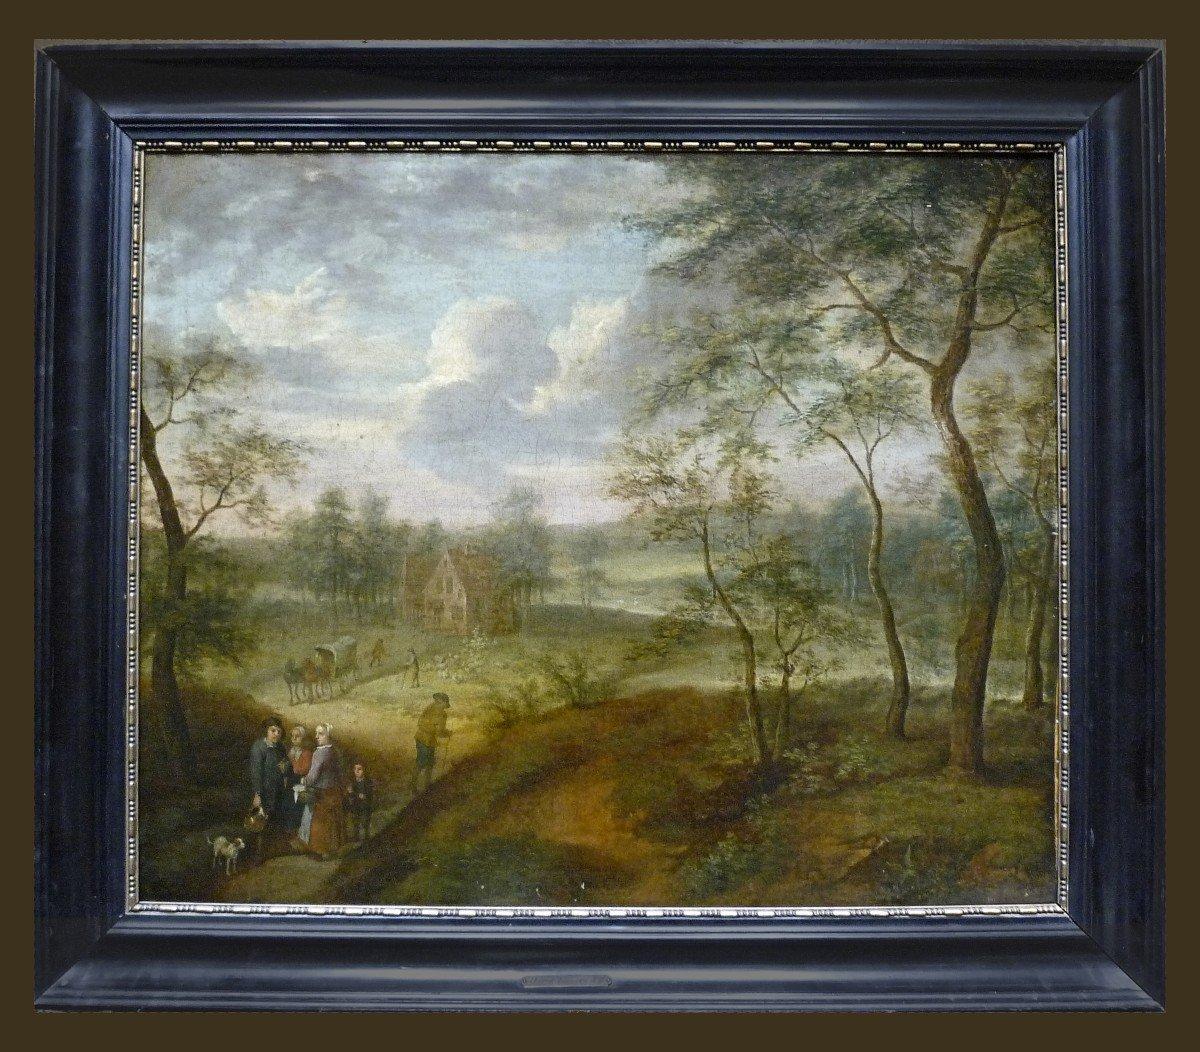 Izaack Van Oosten (1613-1661) Attr.  Paysage  Signé  Provenance : Palais Thott, Copenhague